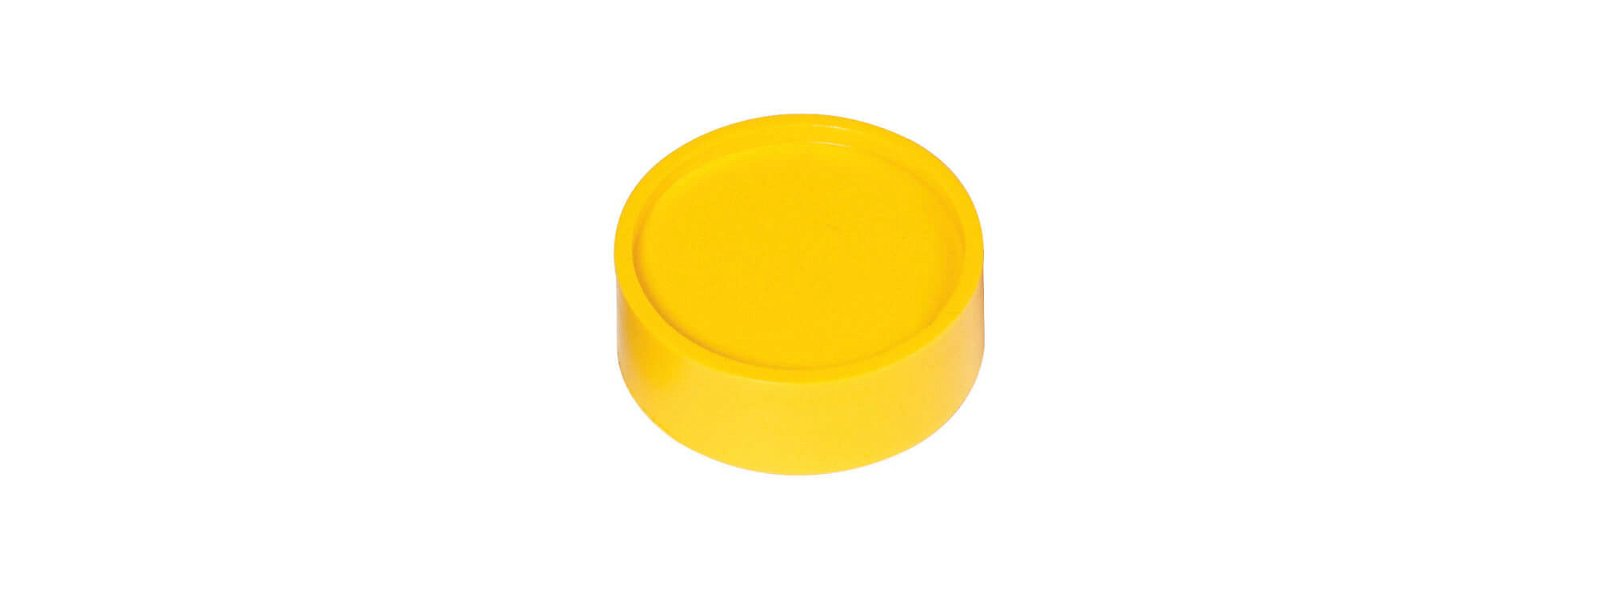 Rund-Magnet, PE Ø 34 mm, 2 kg Haftkraft, 10 St./Set, gelb